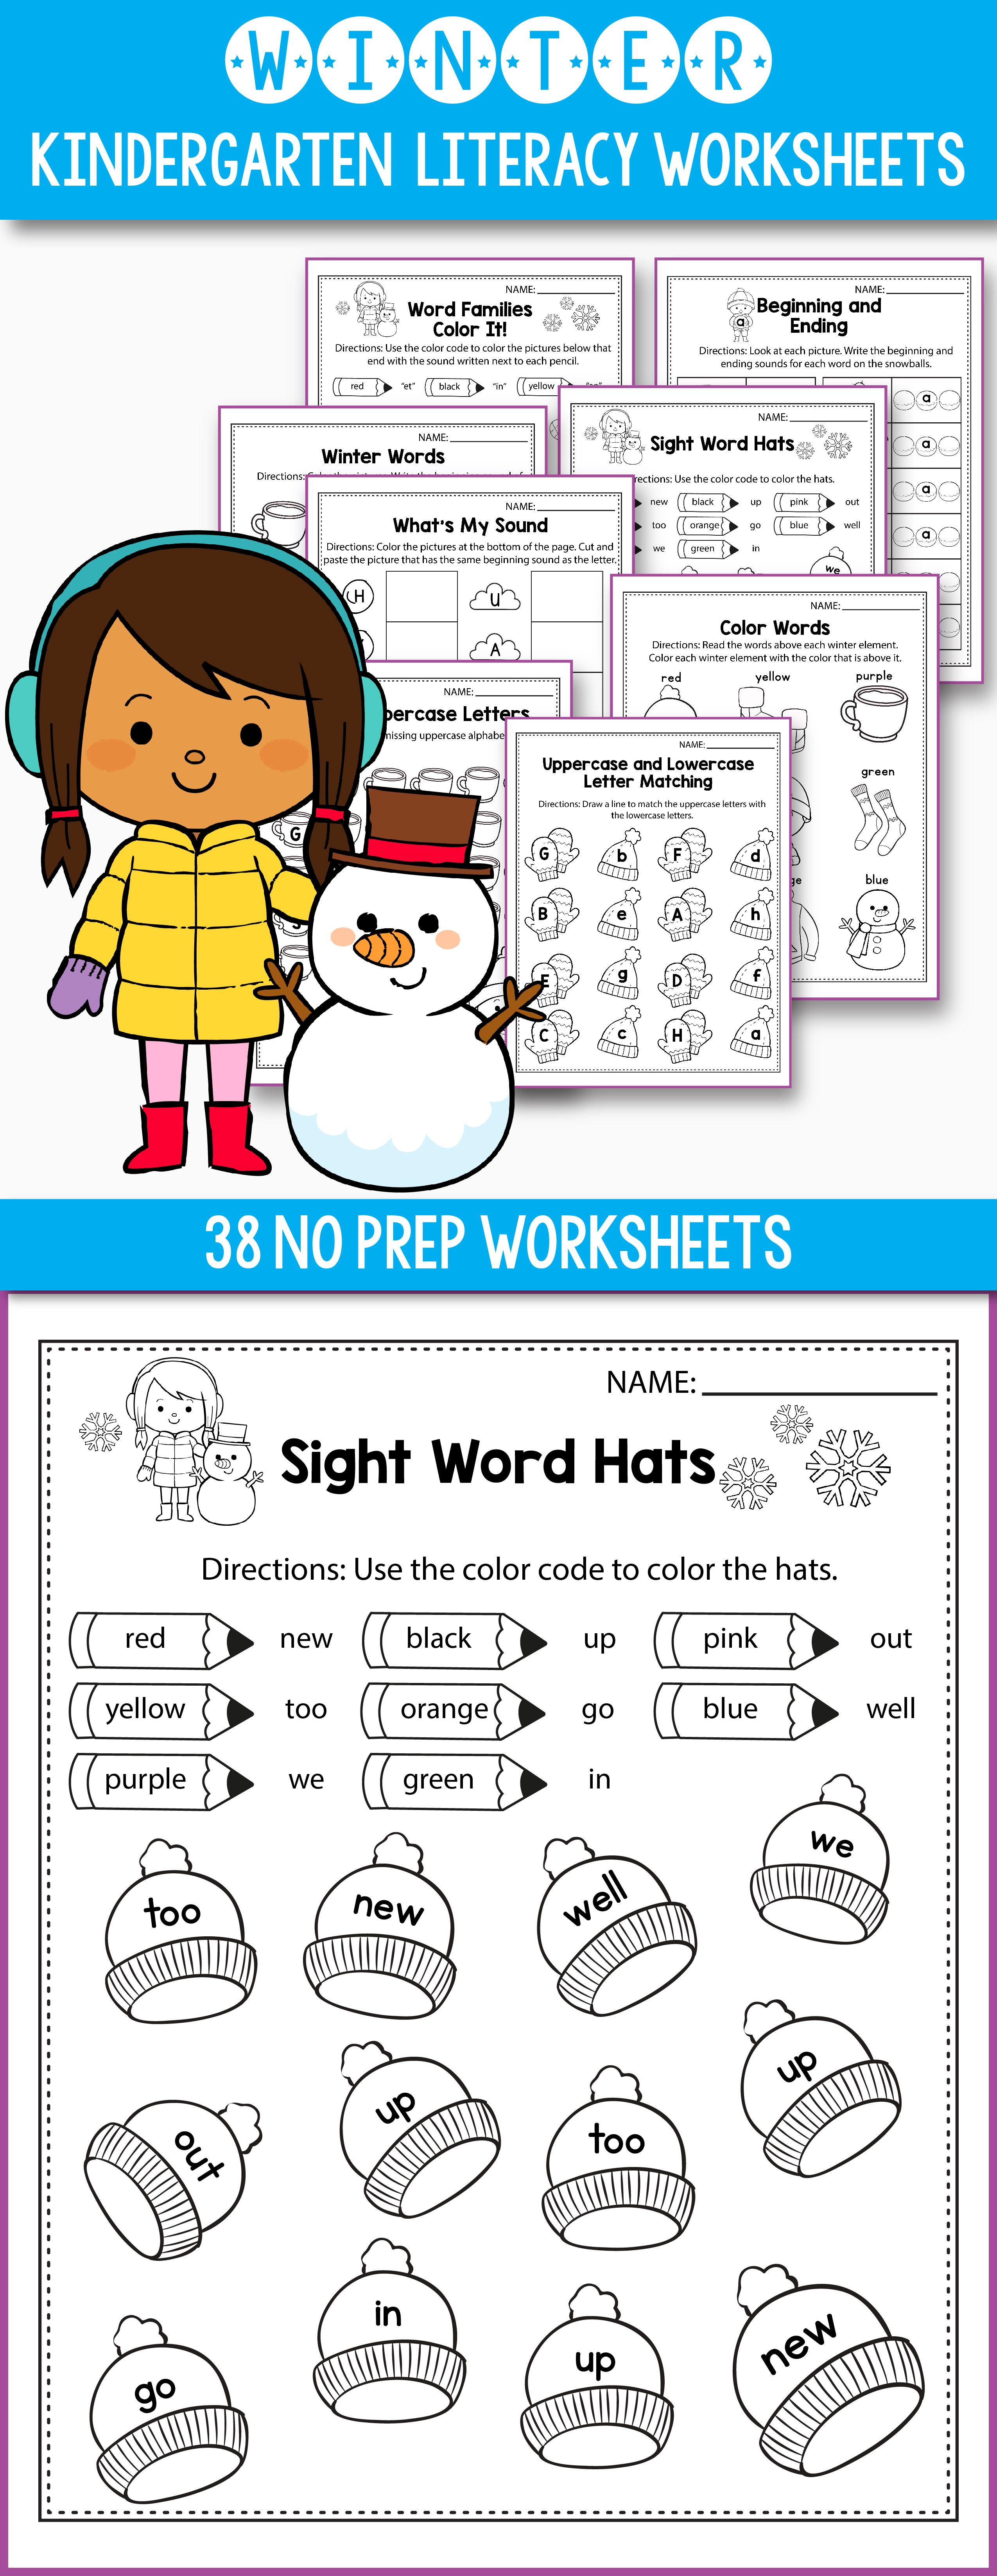 Preschool Kindergarten And Even First Grade Students Will